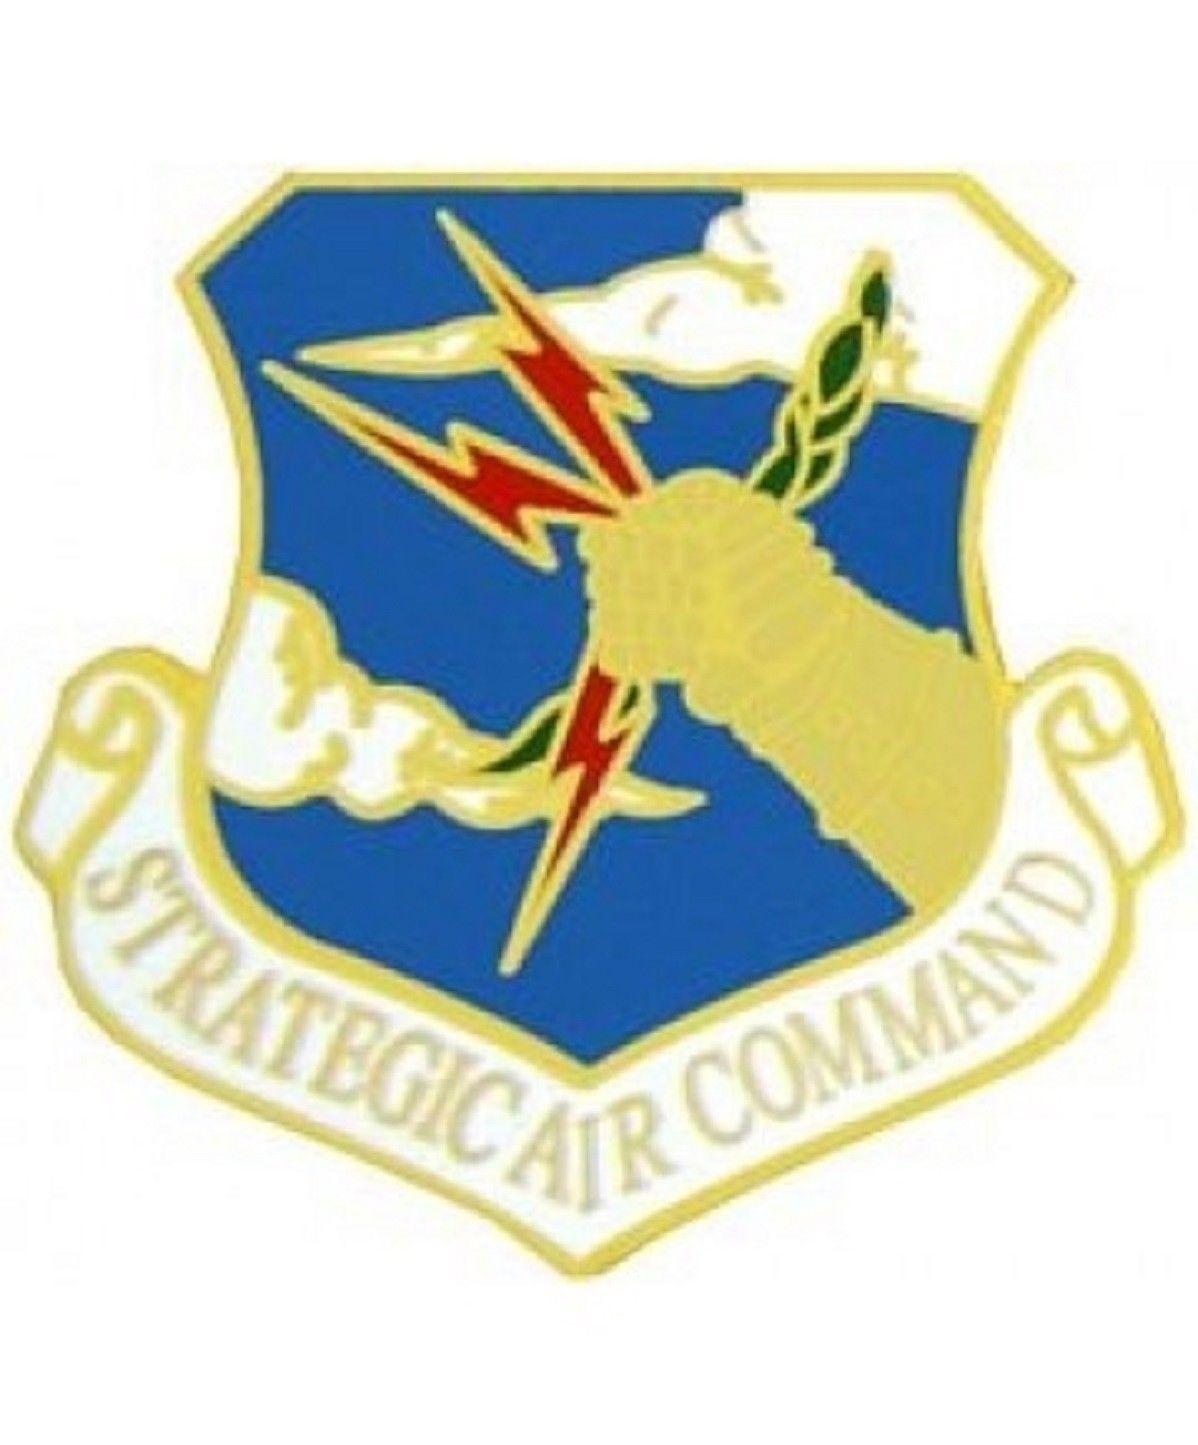 USAF Strategic Air Command (SAC) Air Force and 50 similar items